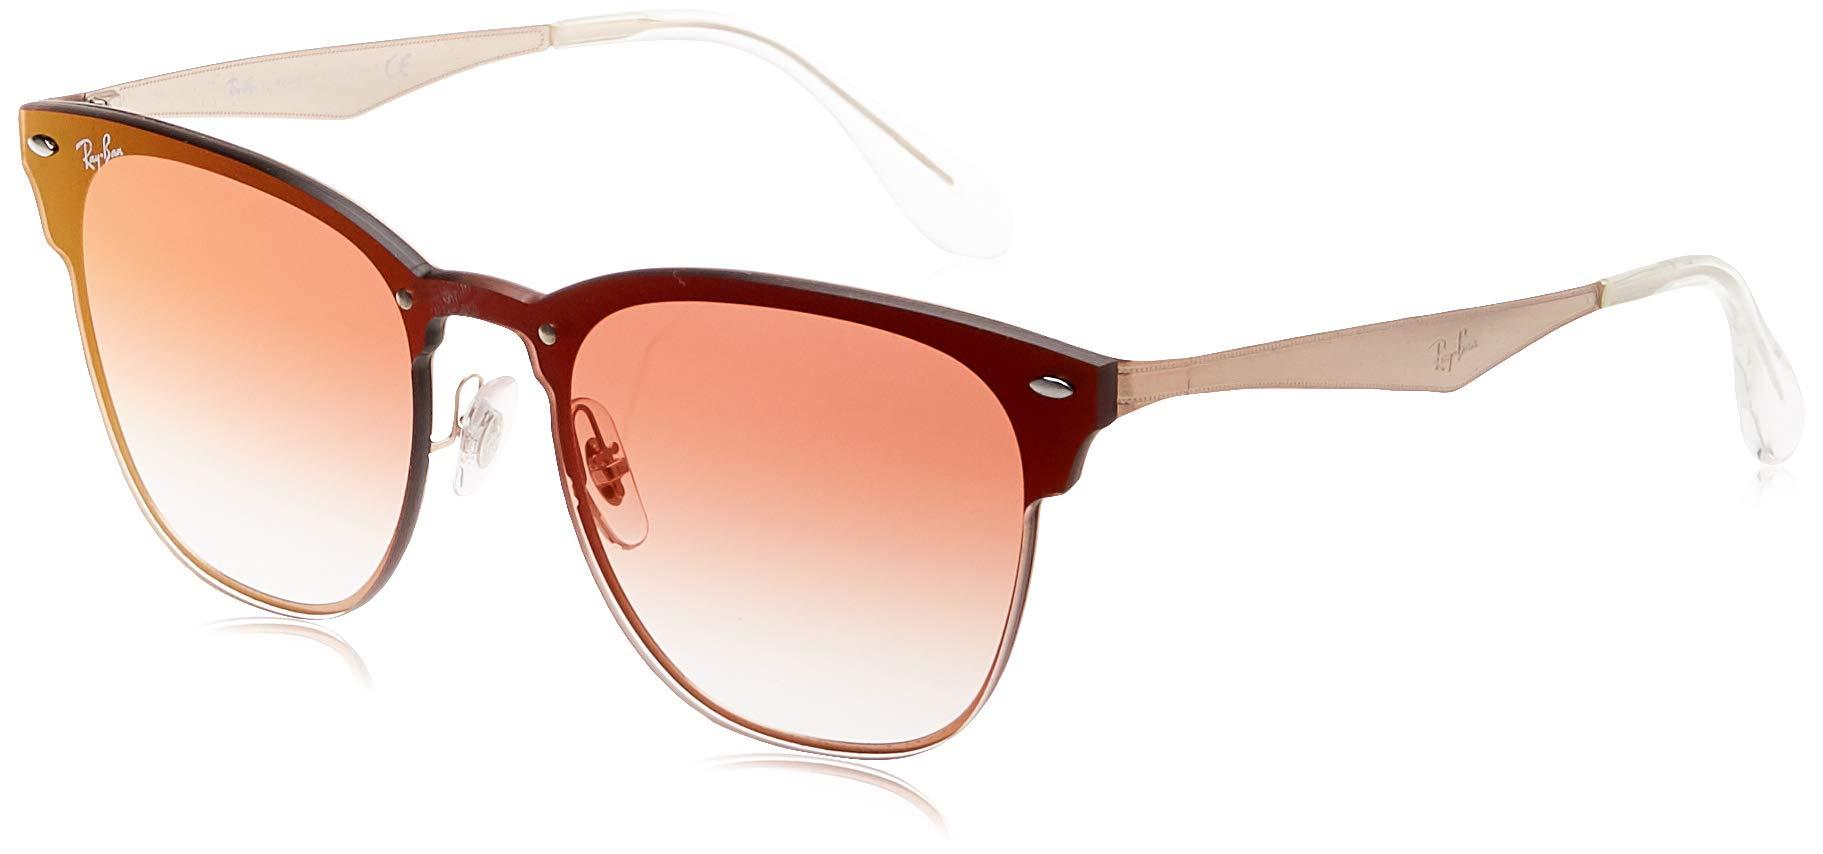 Ray-Ban Women's Wayfarer Flat Sunglasses